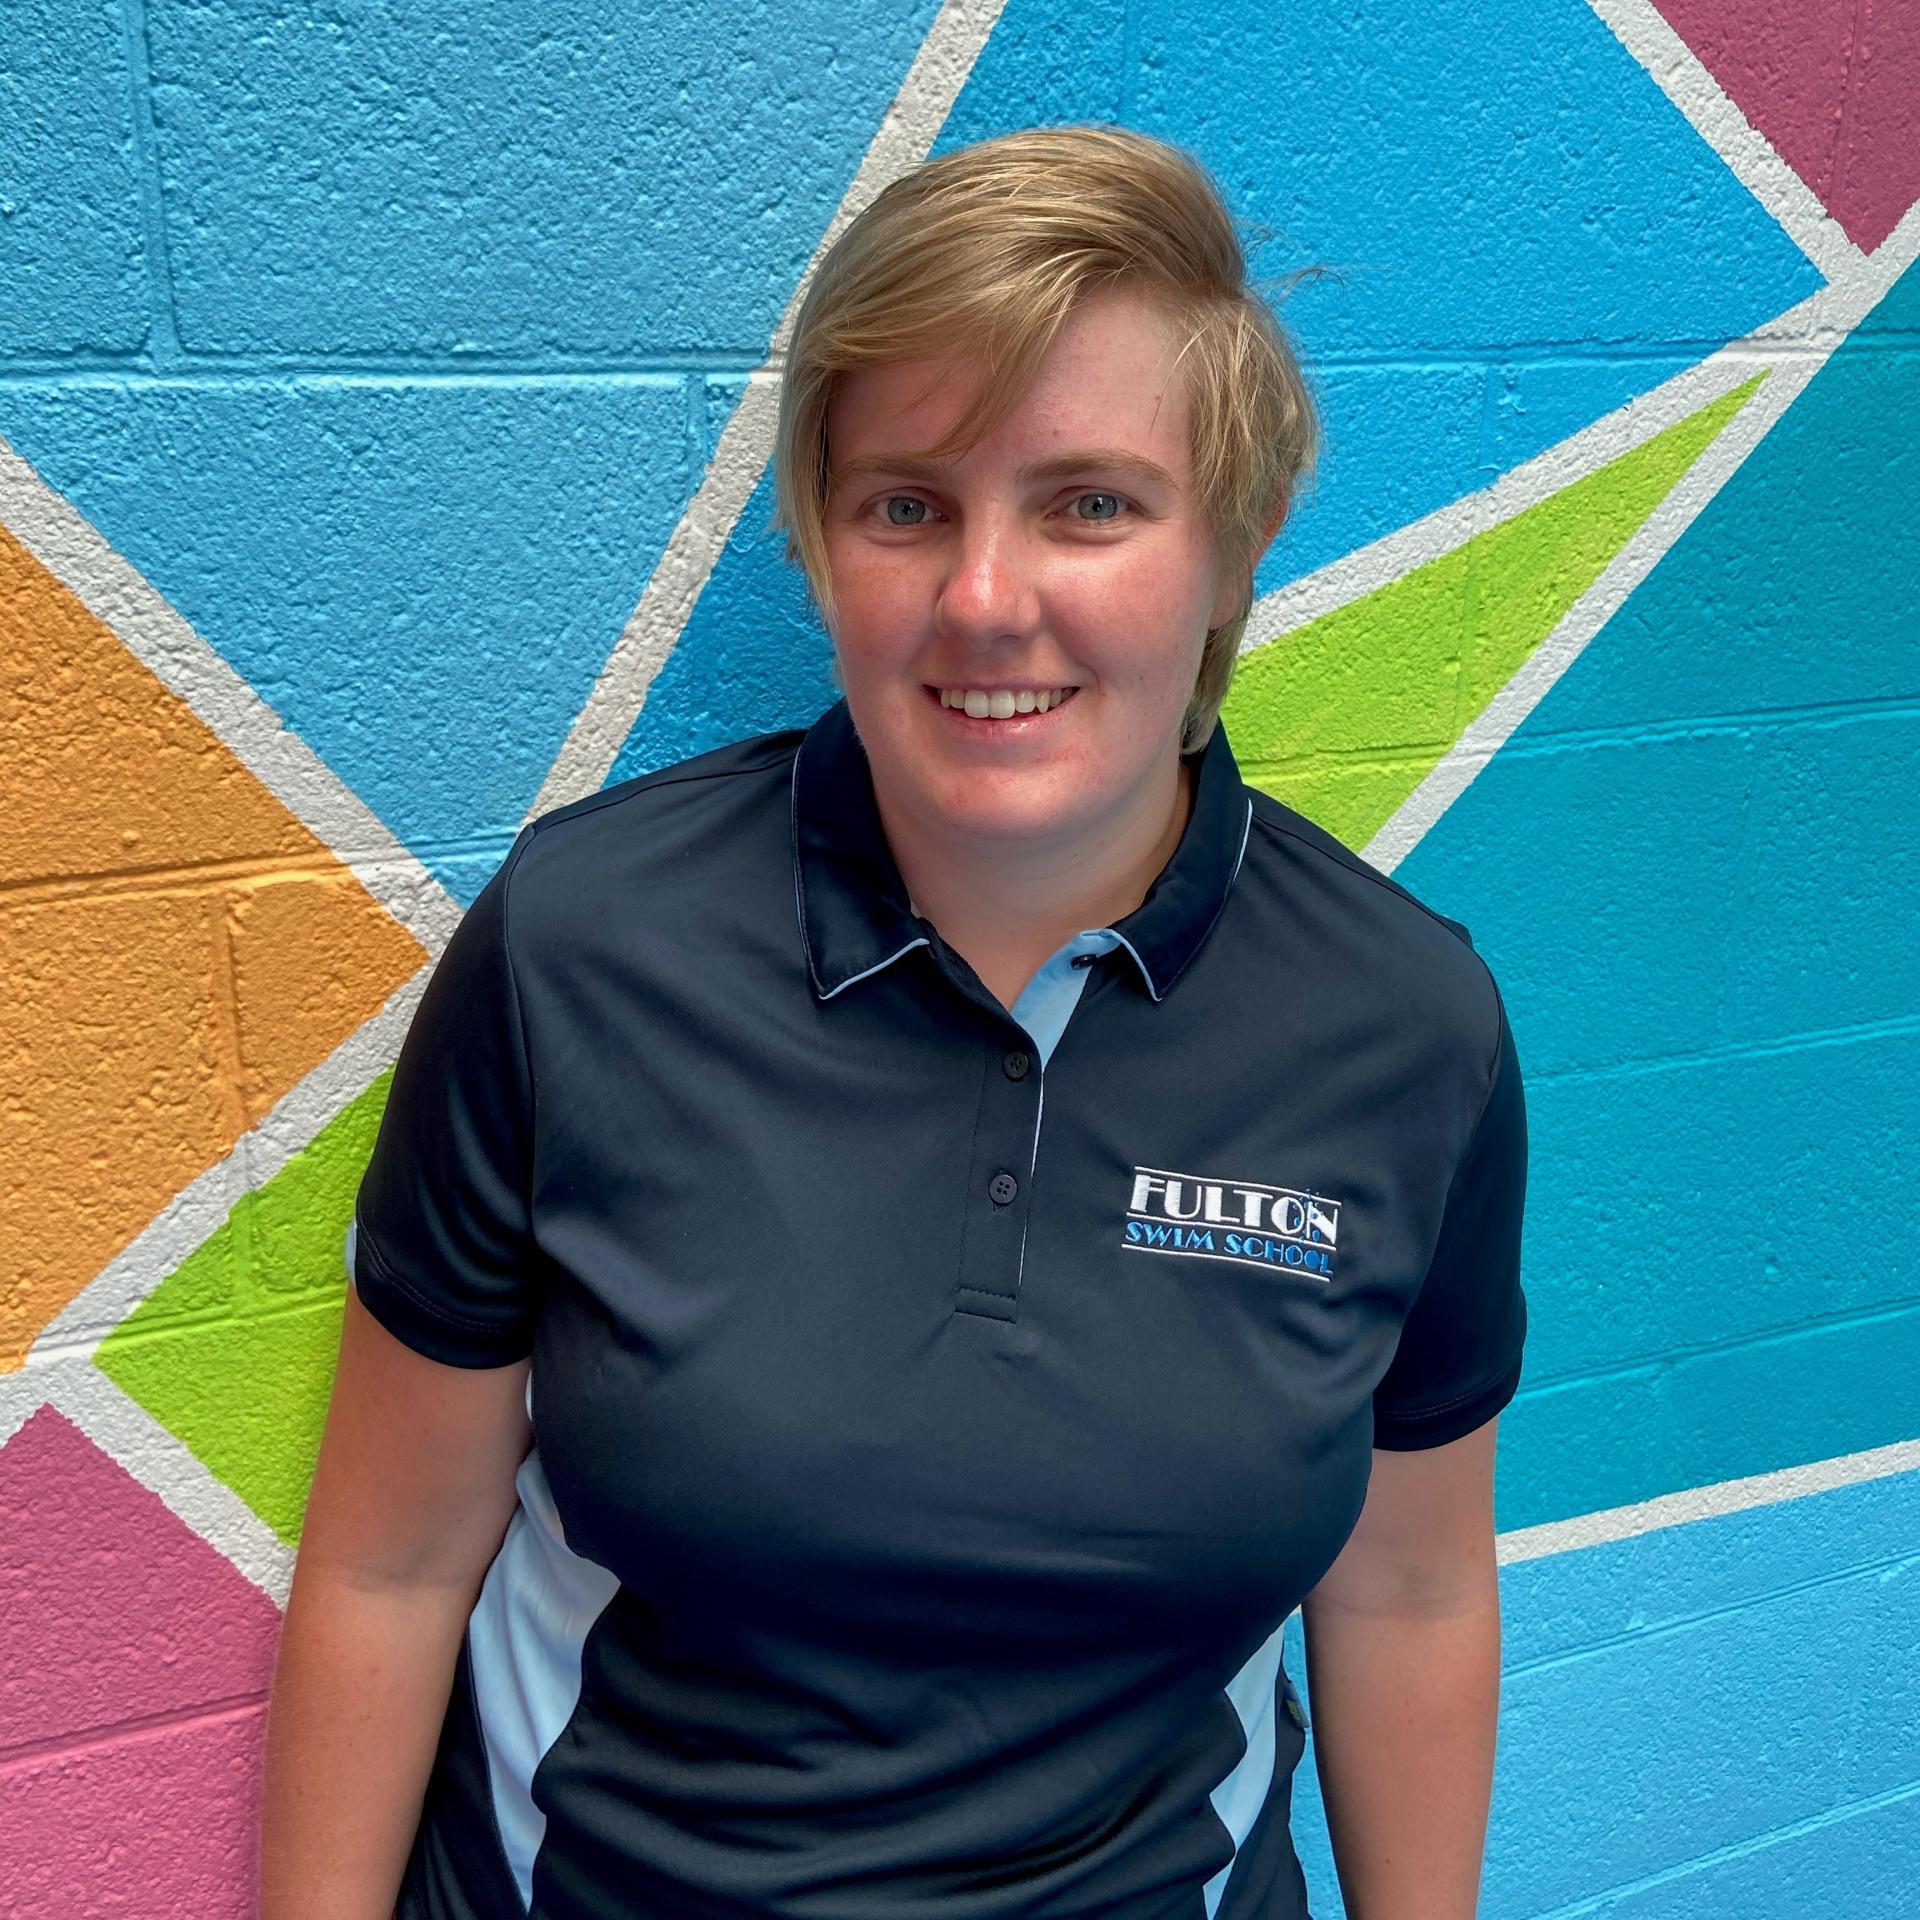 Summer - Fulton Swim School Teacher